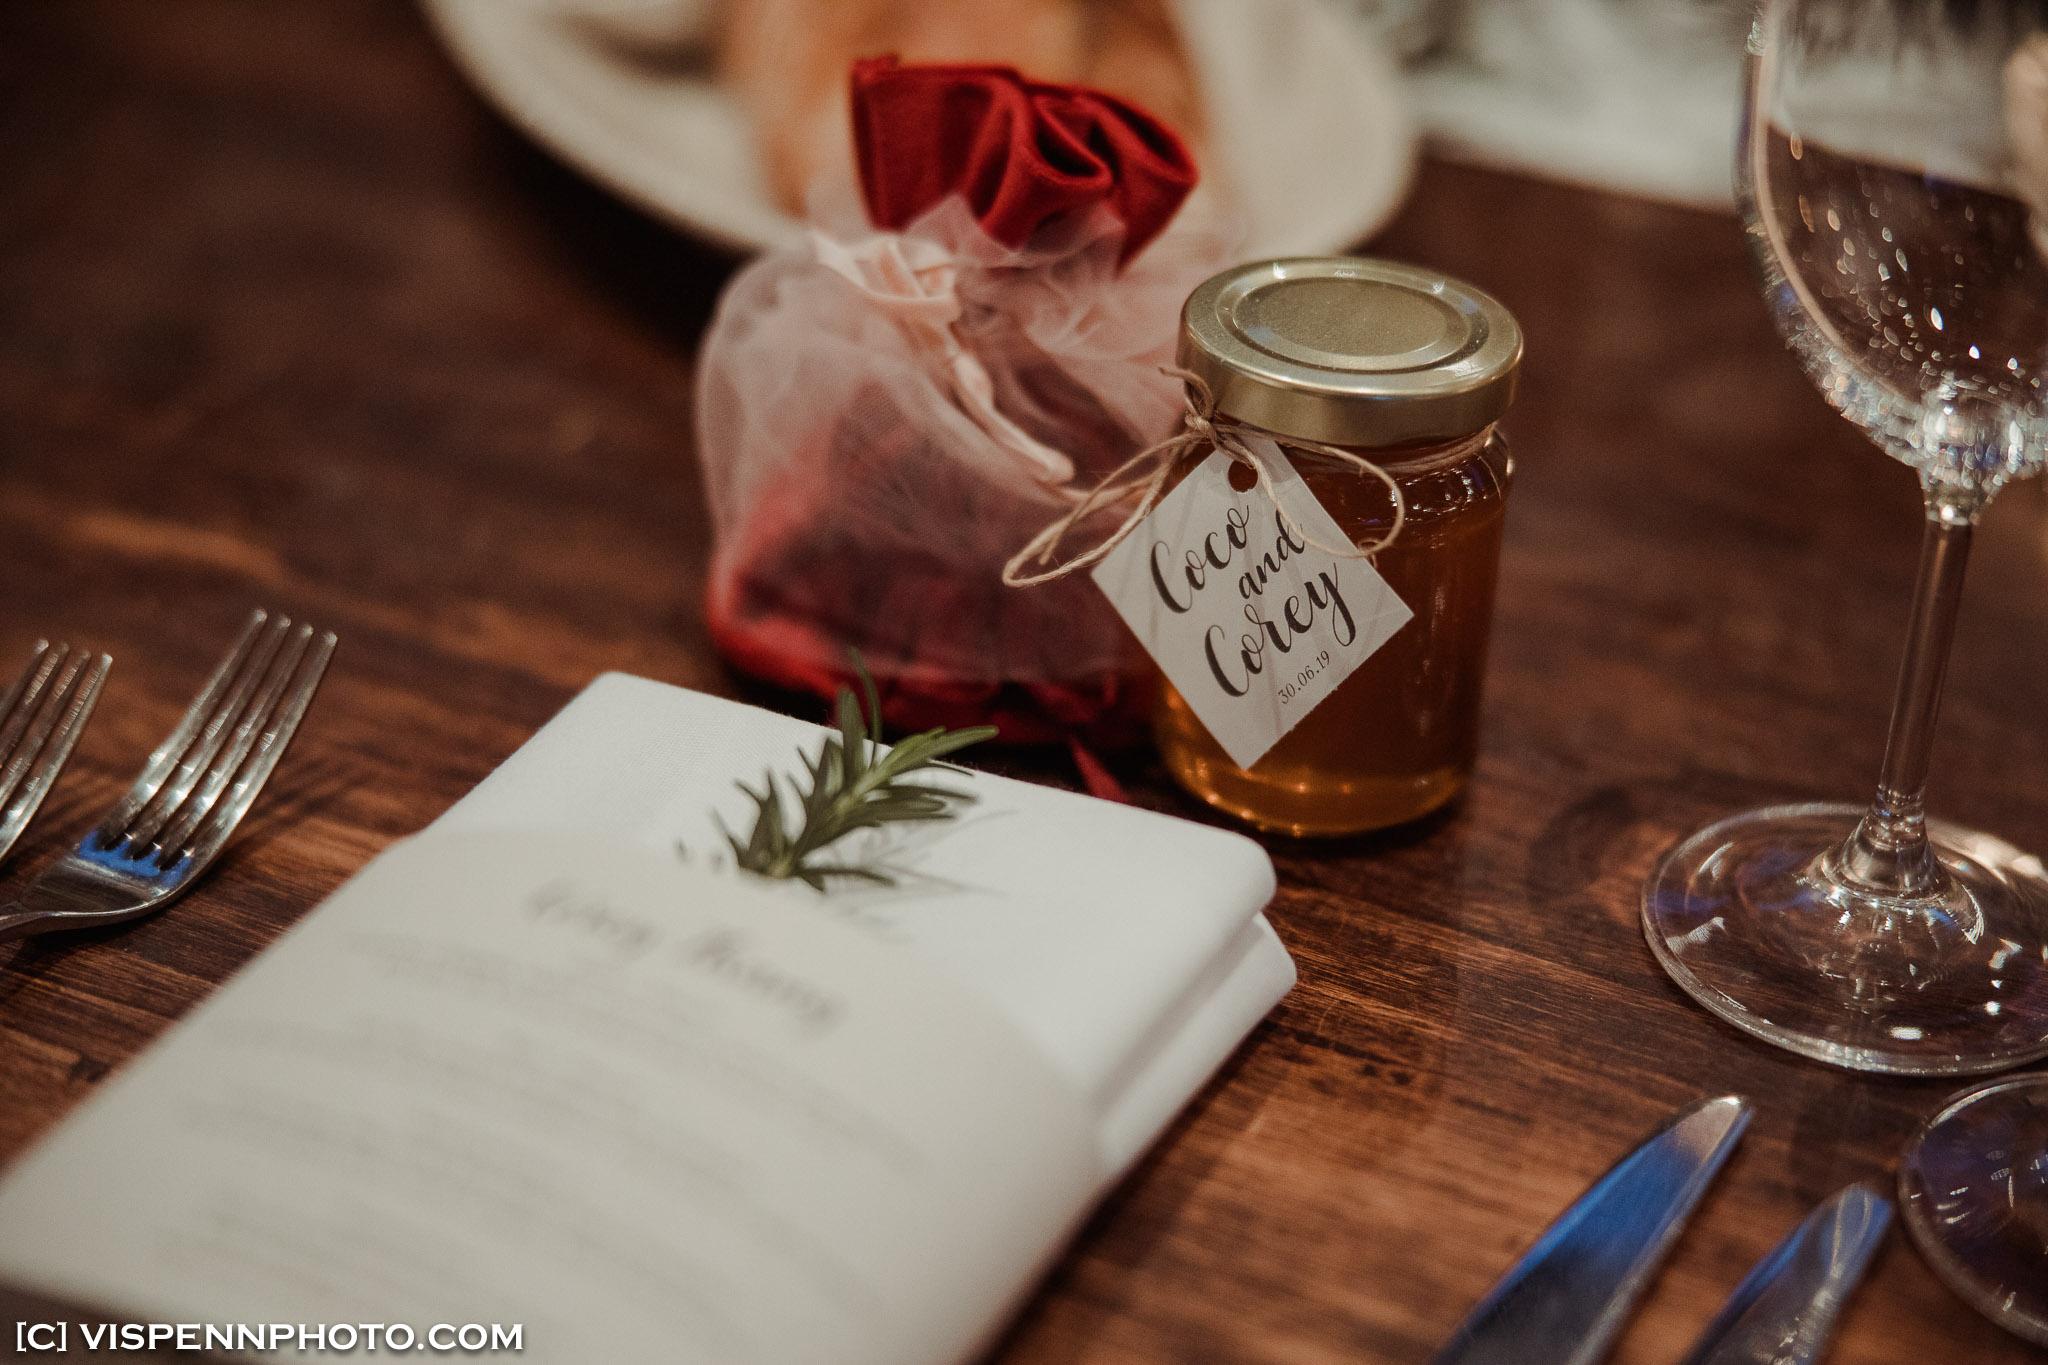 WEDDING DAY Photography Melbourne CoreyCoco 1P 04852 EOSR ZHPENN